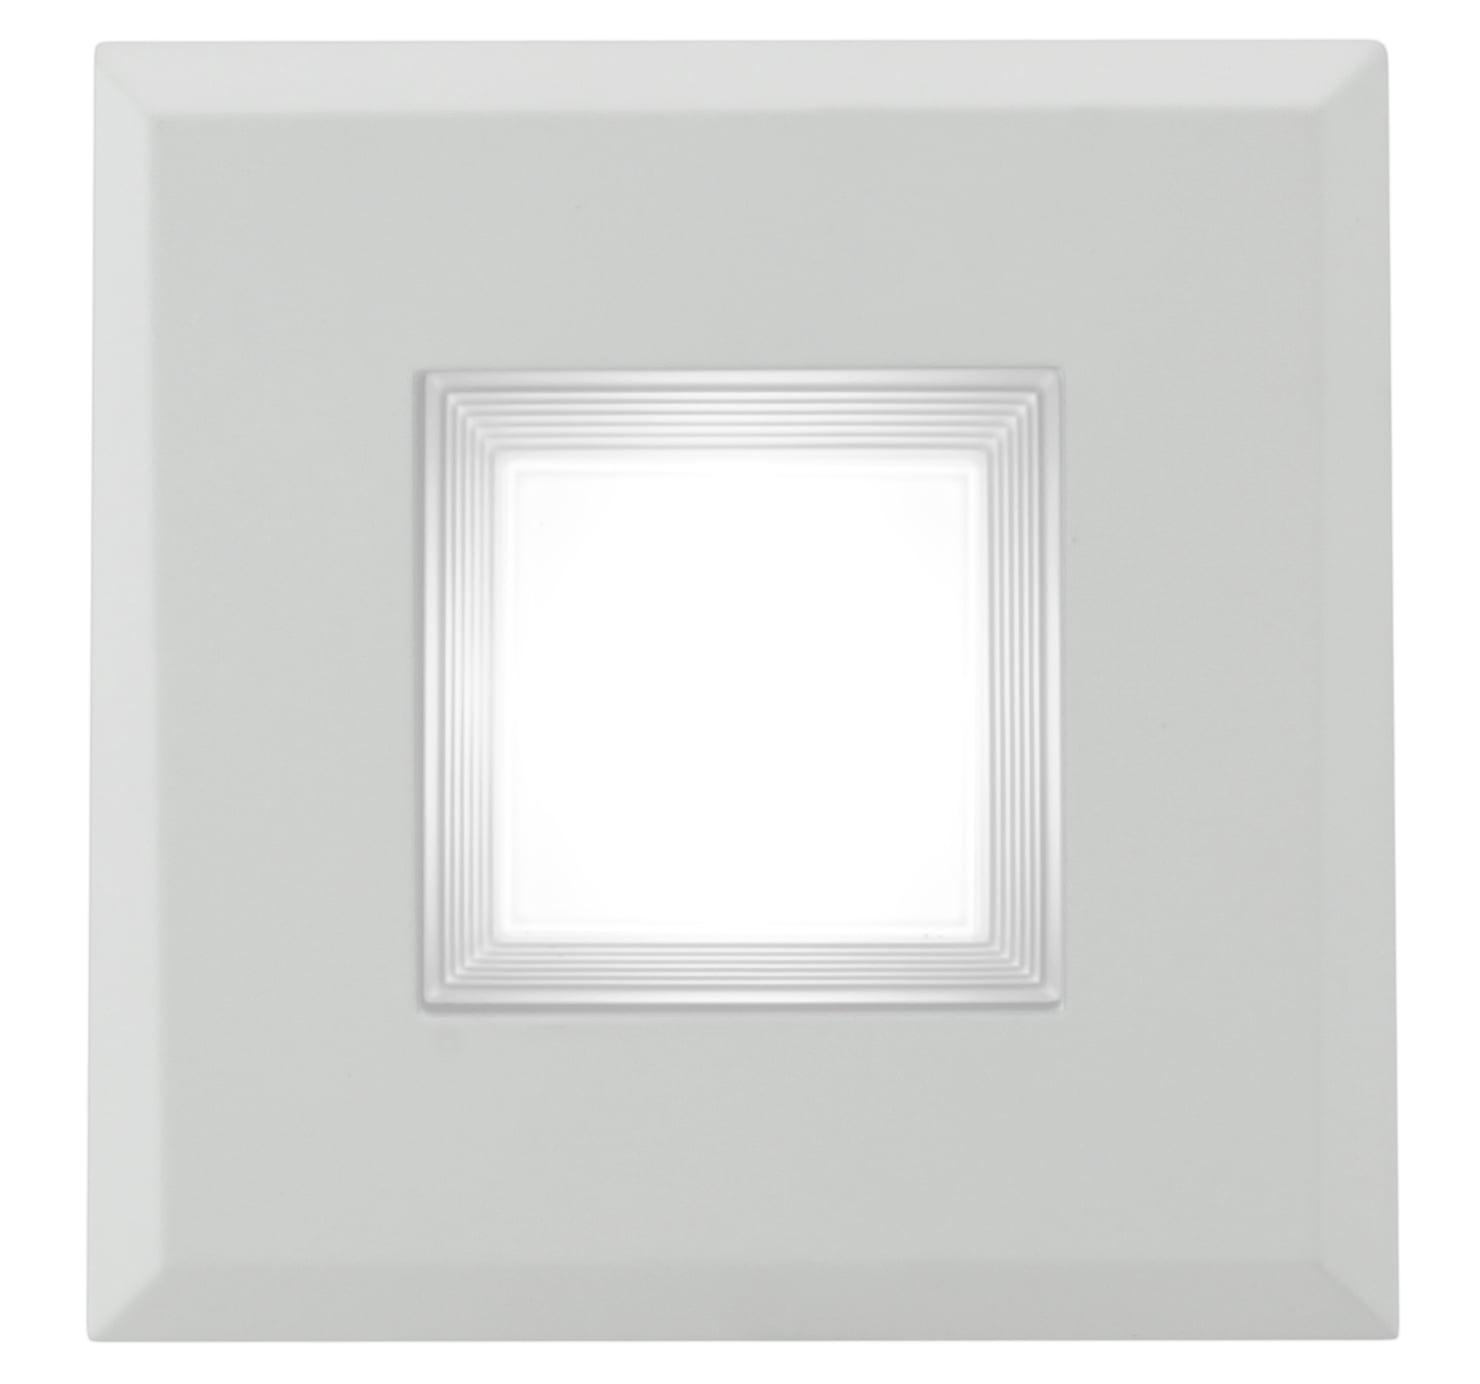 White DQR3-10-120-2K-WH-BF NICOR Lighting 3-Inch Square 2700K LED Recessed Downlight Retrofit Kit